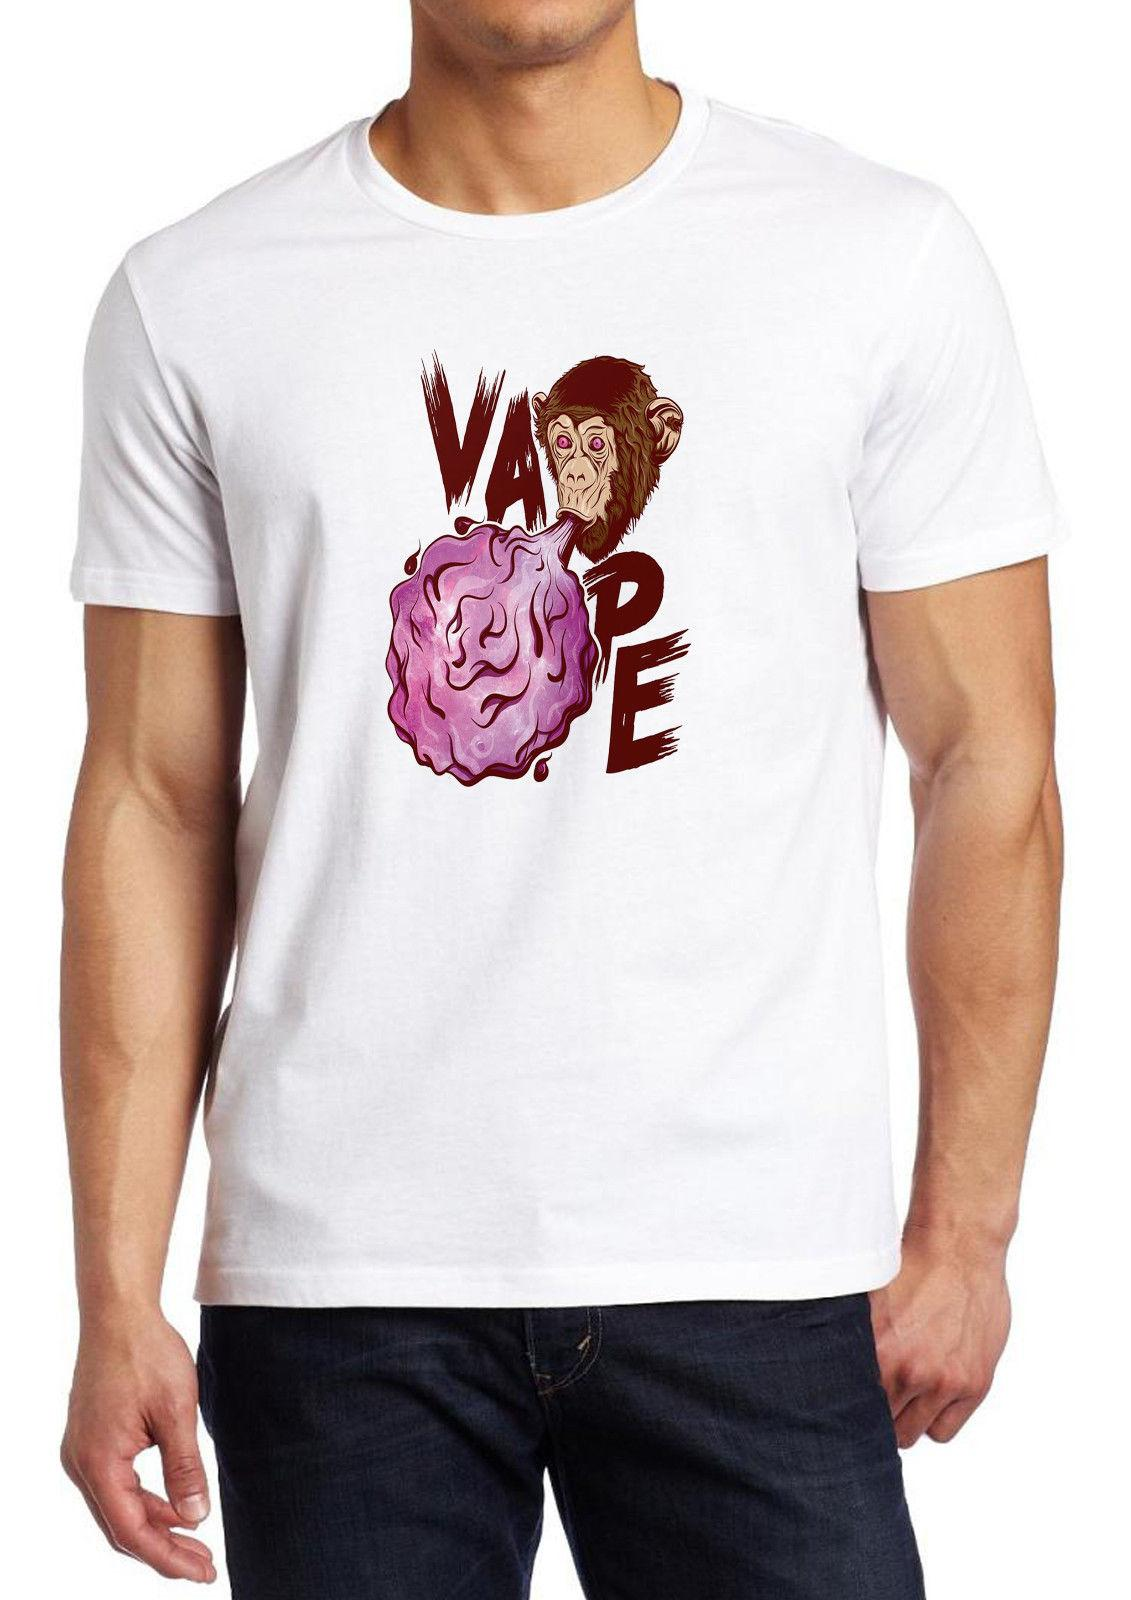 7d8d4d8f40d0e Compre Vaper Vape Nation Life 420 Go Green Coil Drip Monkey Fruit Of The Loom  Camiseta A  11.01 Del Bstdhgate